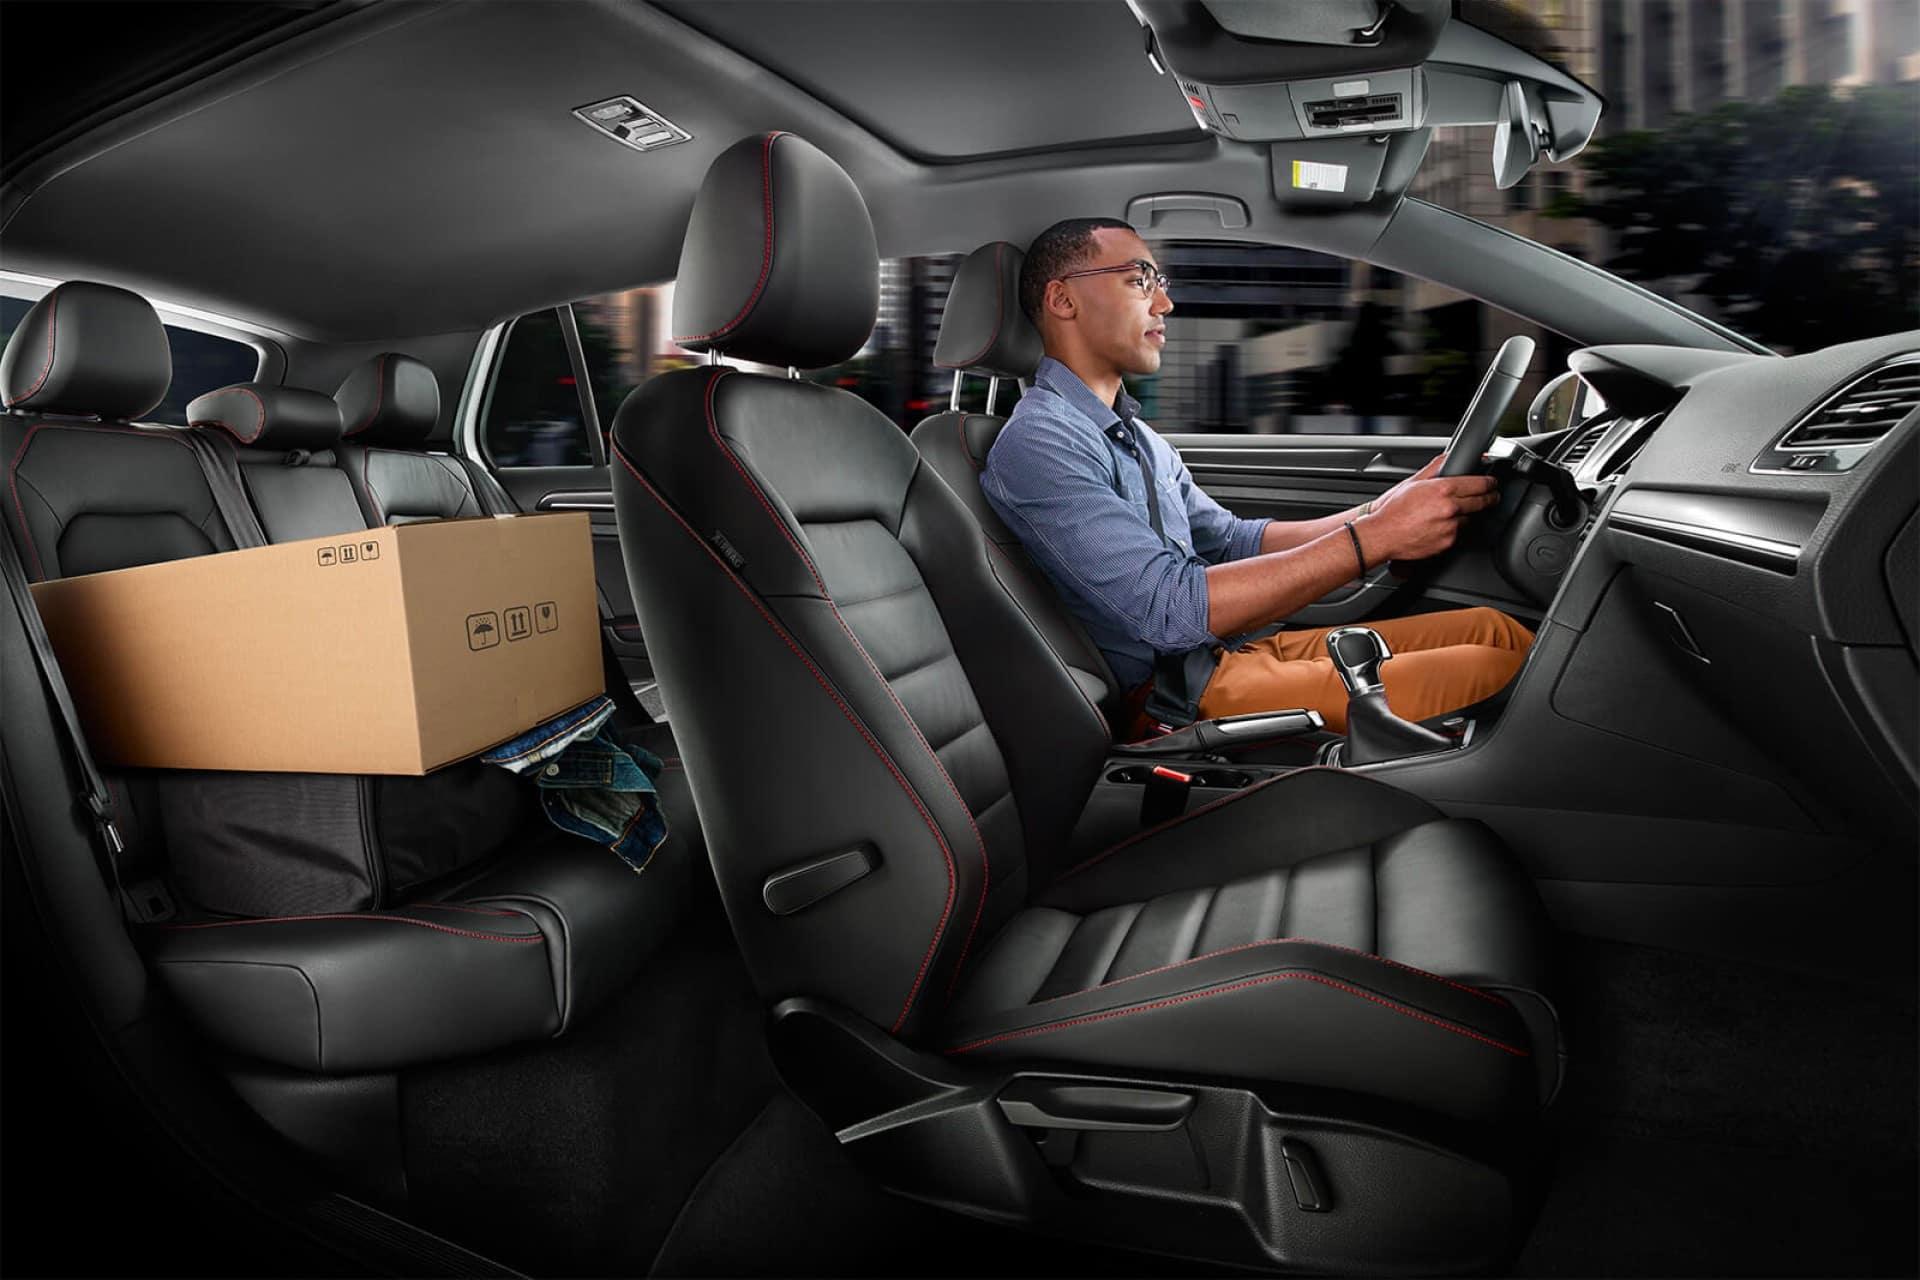 Volkswagen_Golf_GTI_Interior_Cabin_Space